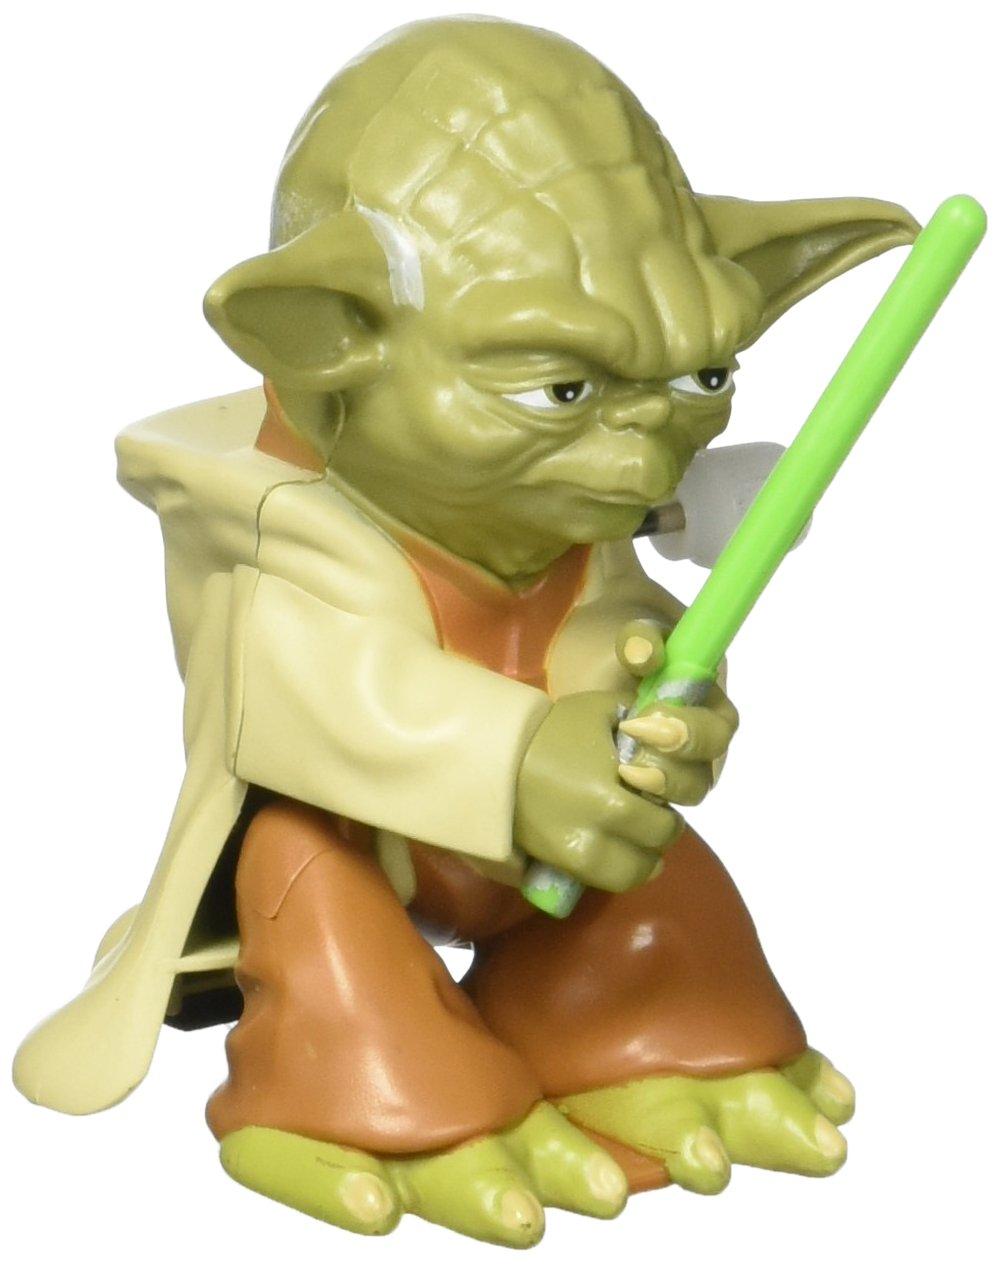 Star Wars Disney Yoda Wind-up Flipping Toy by Star Wars (Image #1)